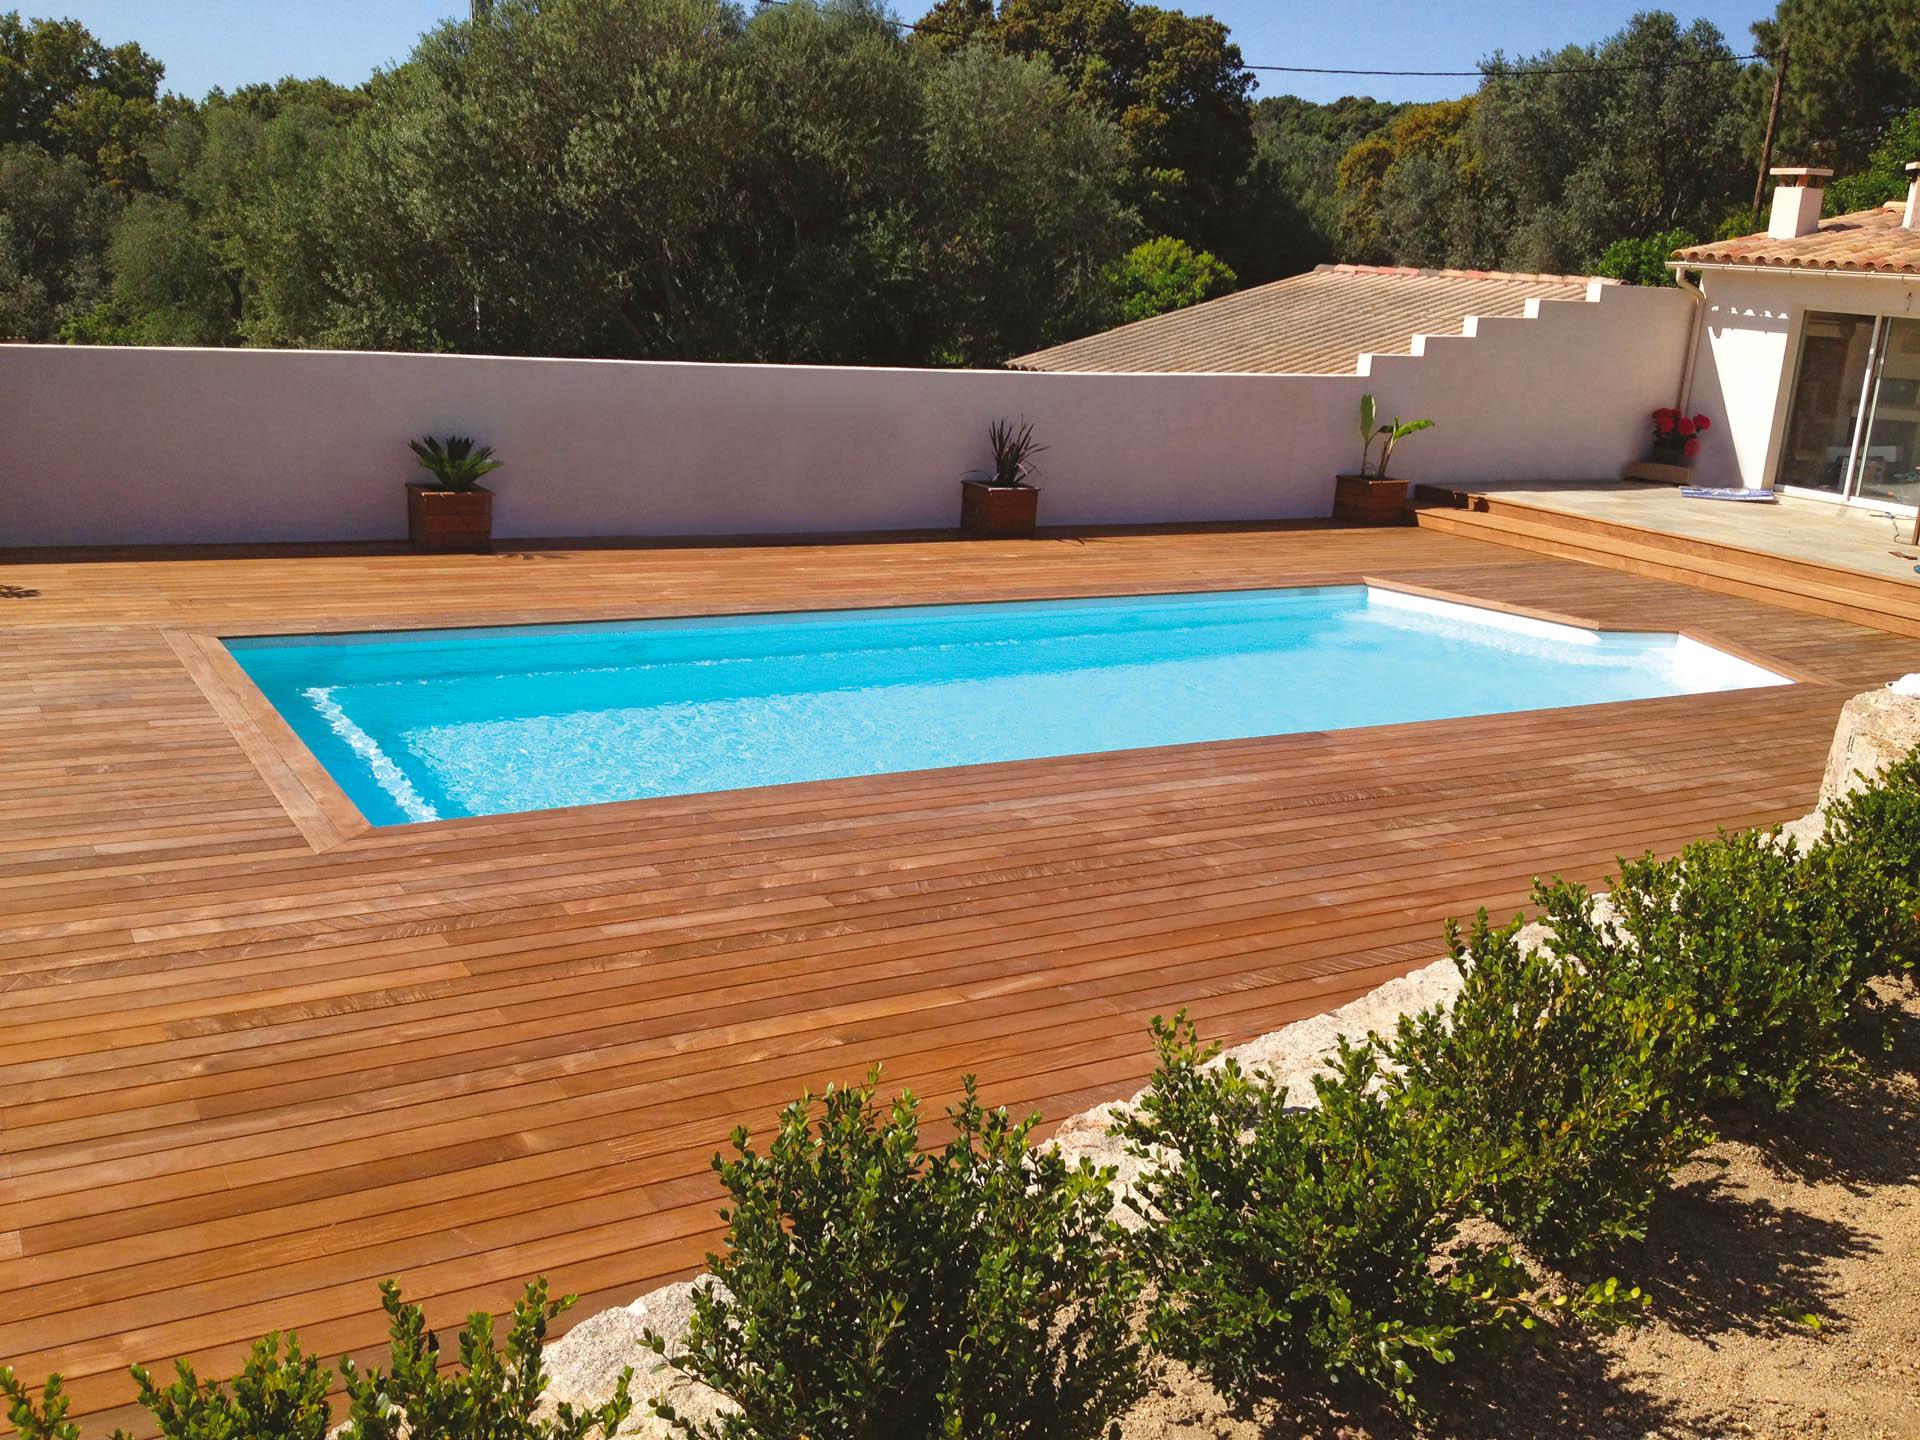 piscine coque polyester forme rectangulaire 11x4 a fond plat california 3 piscines ibiza